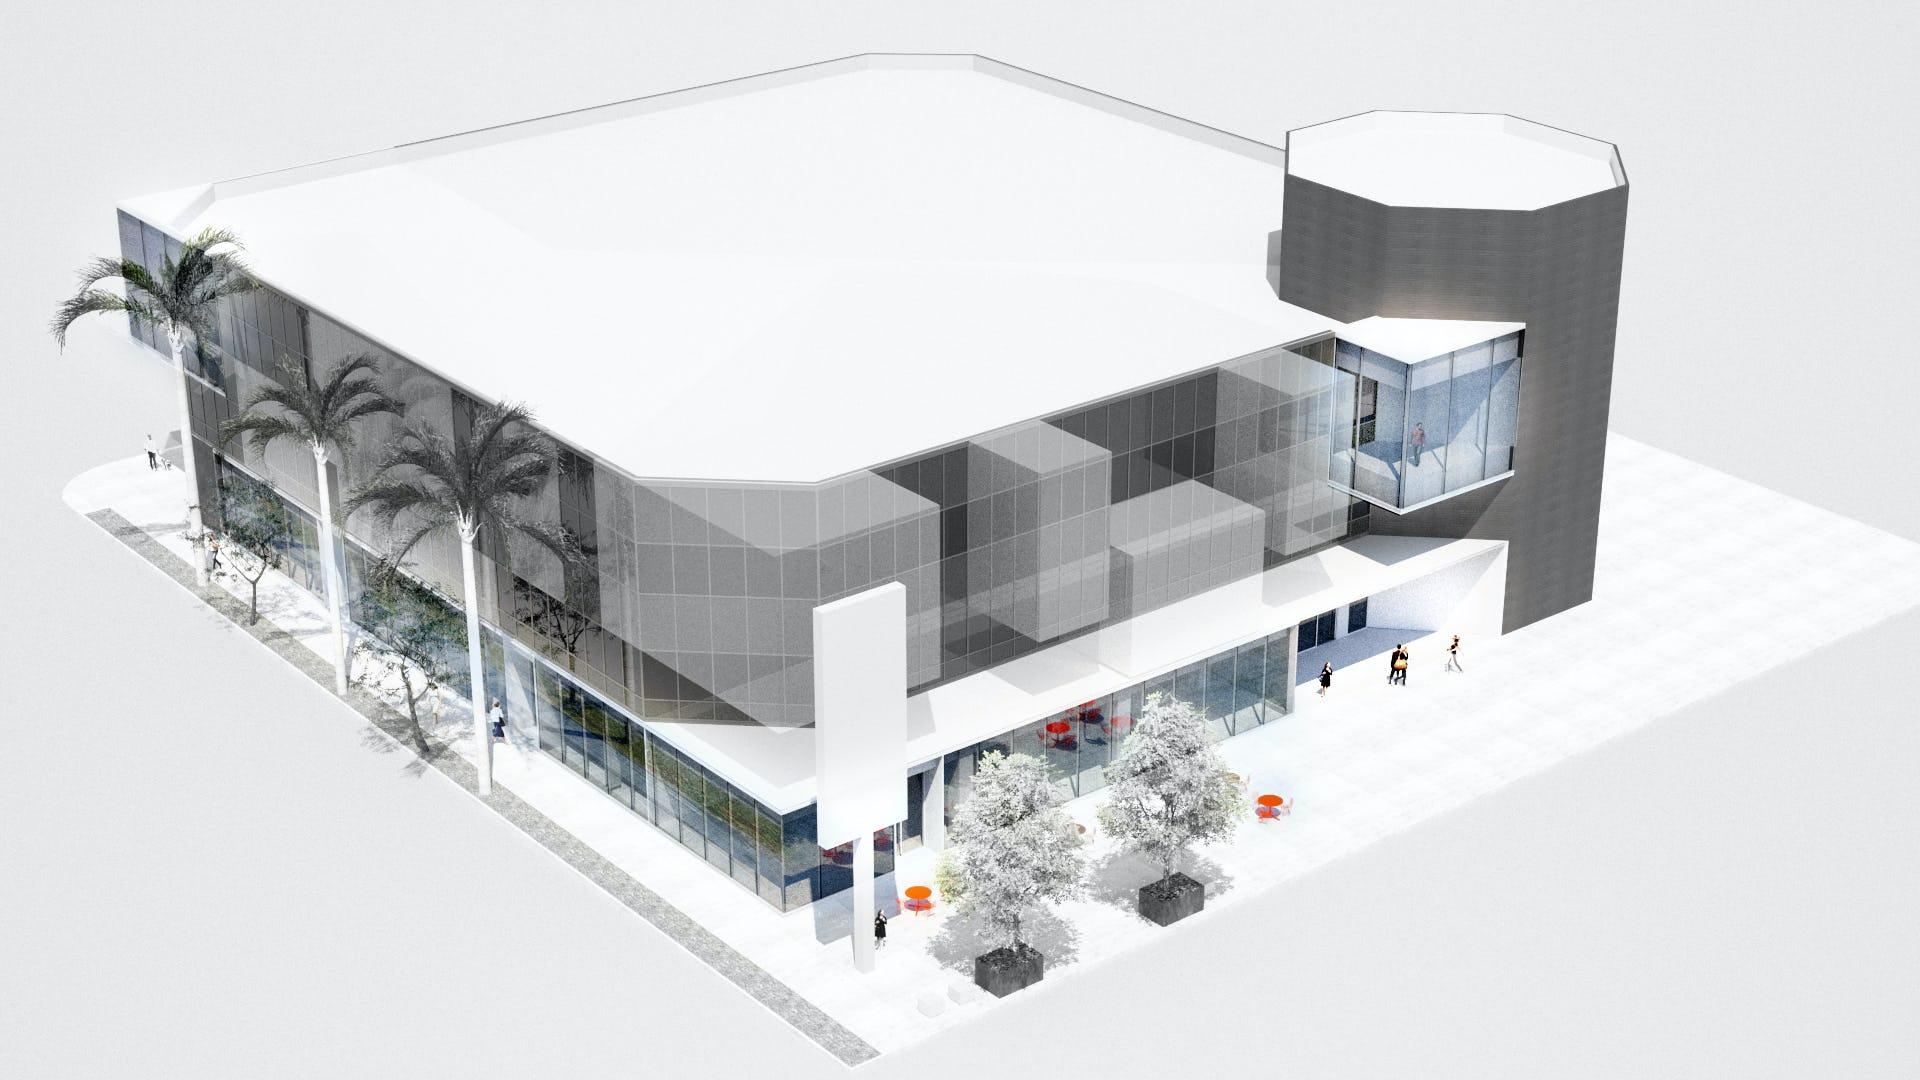 Lax rendering